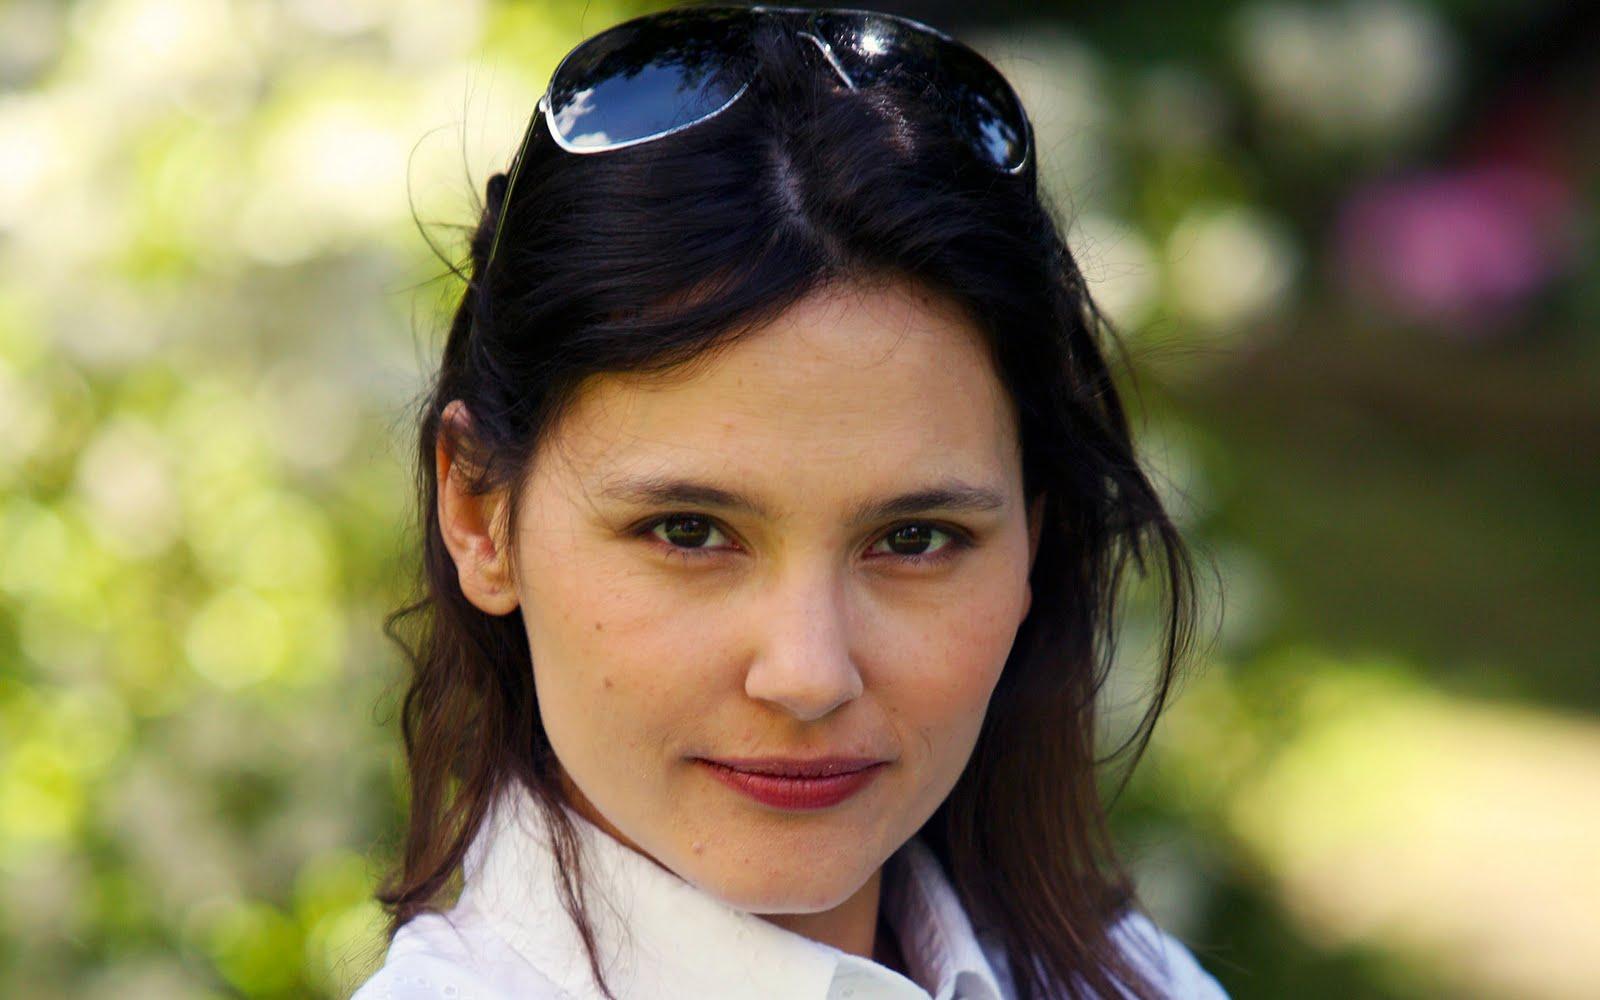 http://1.bp.blogspot.com/-GDIT_qlS-n4/TfQ-ZSX_QNI/AAAAAAAACfA/XKxZxAhzAPQ/s1600/Pictures+of+Stage+Actress+Virginie+Ledoyen+%25283%2529.jpg